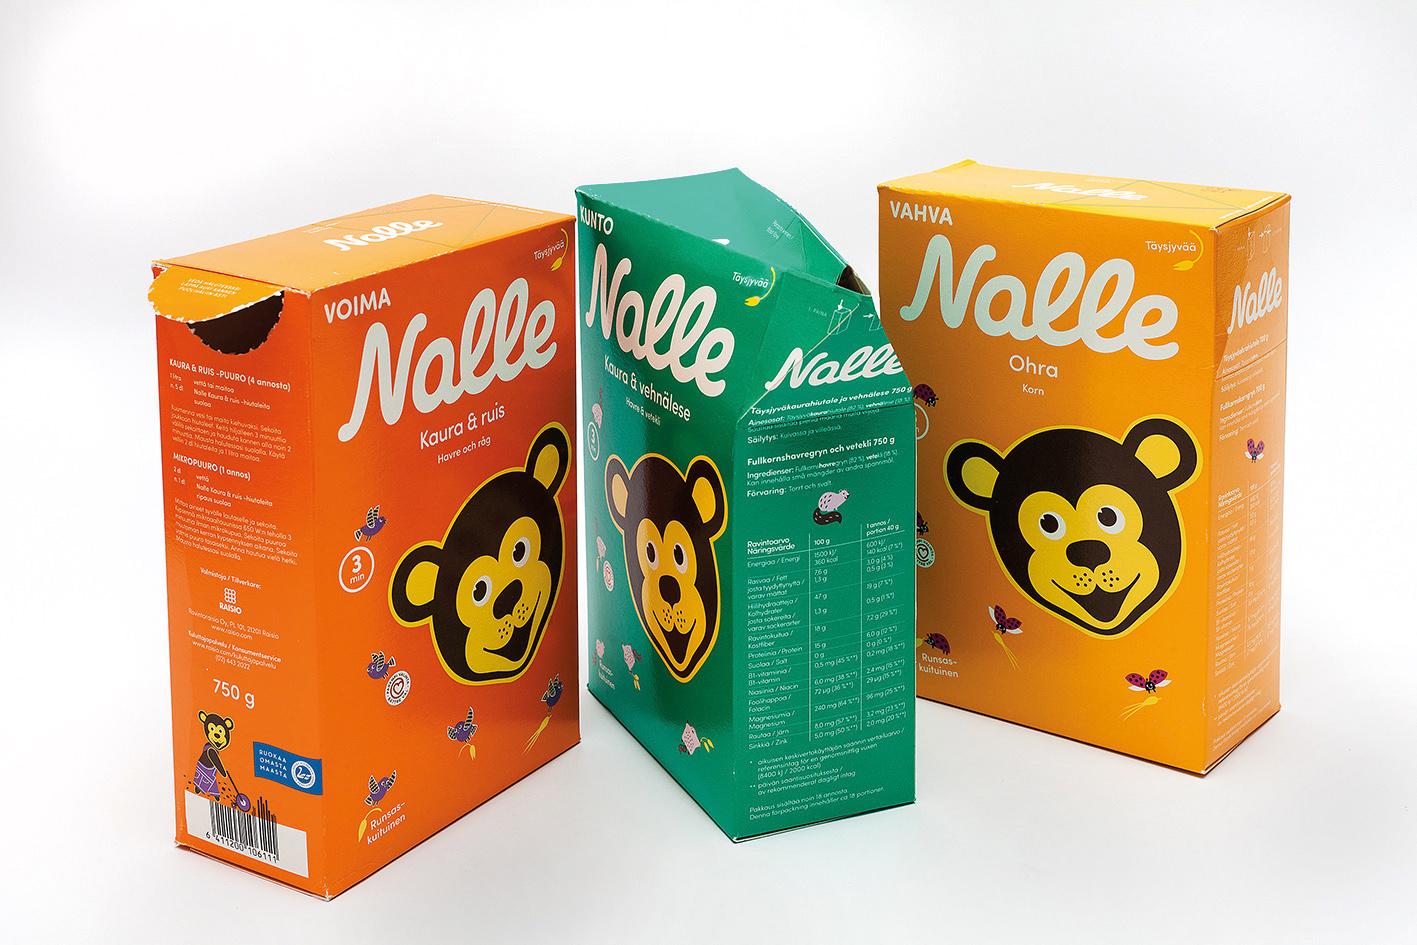 Nalle Oat Flakes